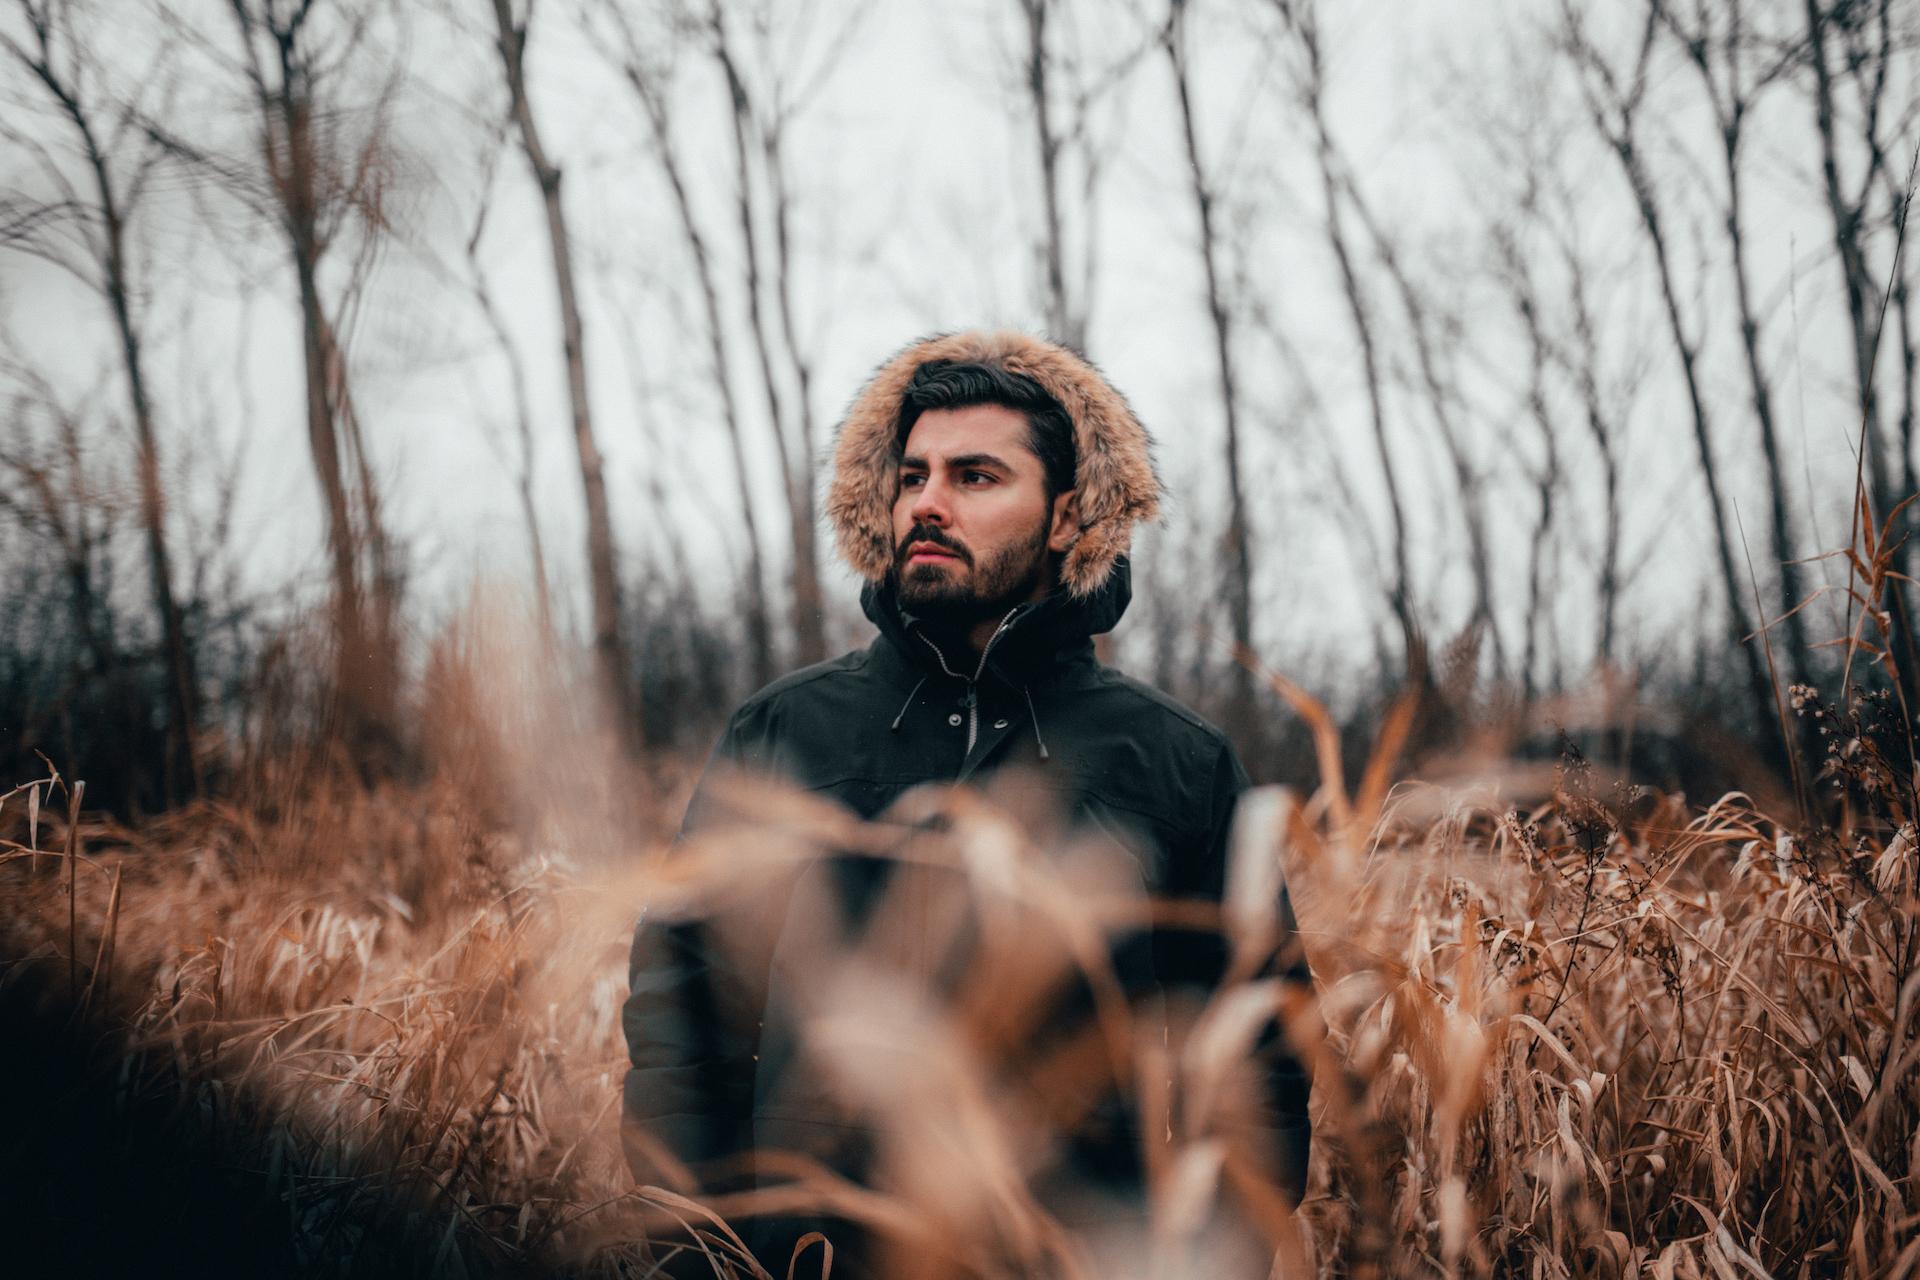 Toronto Photographer Creative Director Alen Palander - YFS Magazine